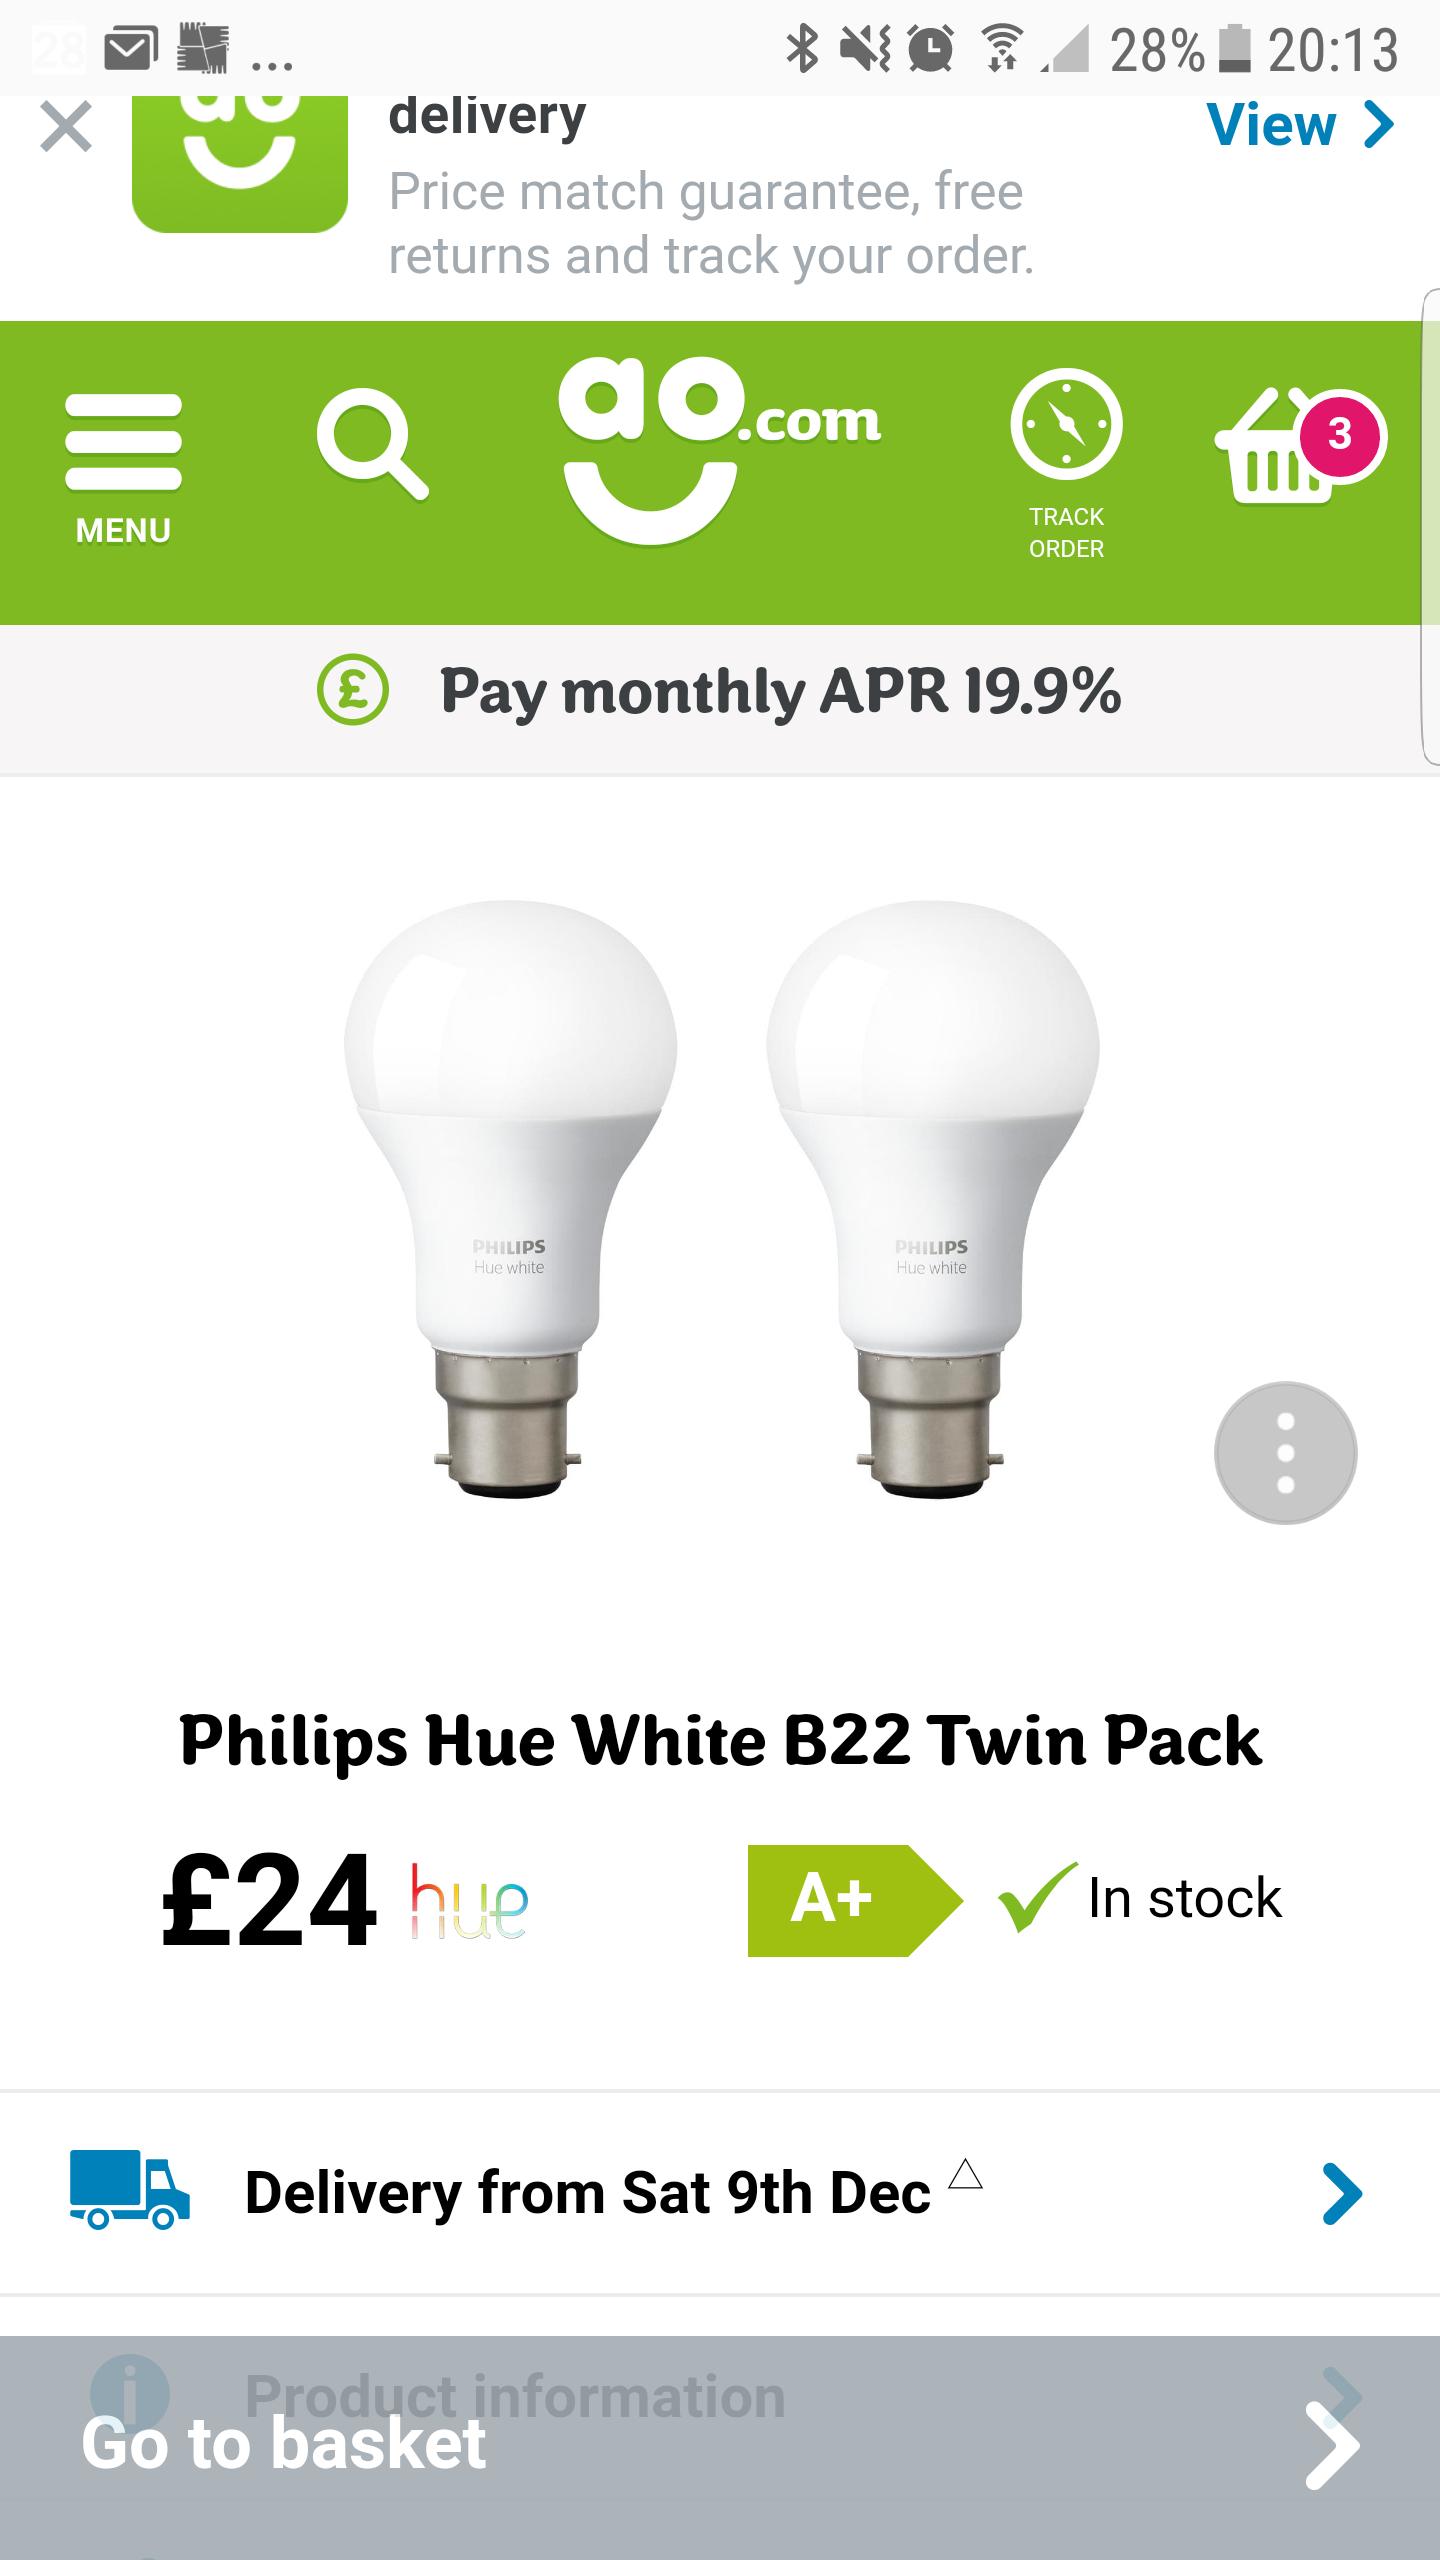 Philips hue white b22 x6 for £48 @ AO